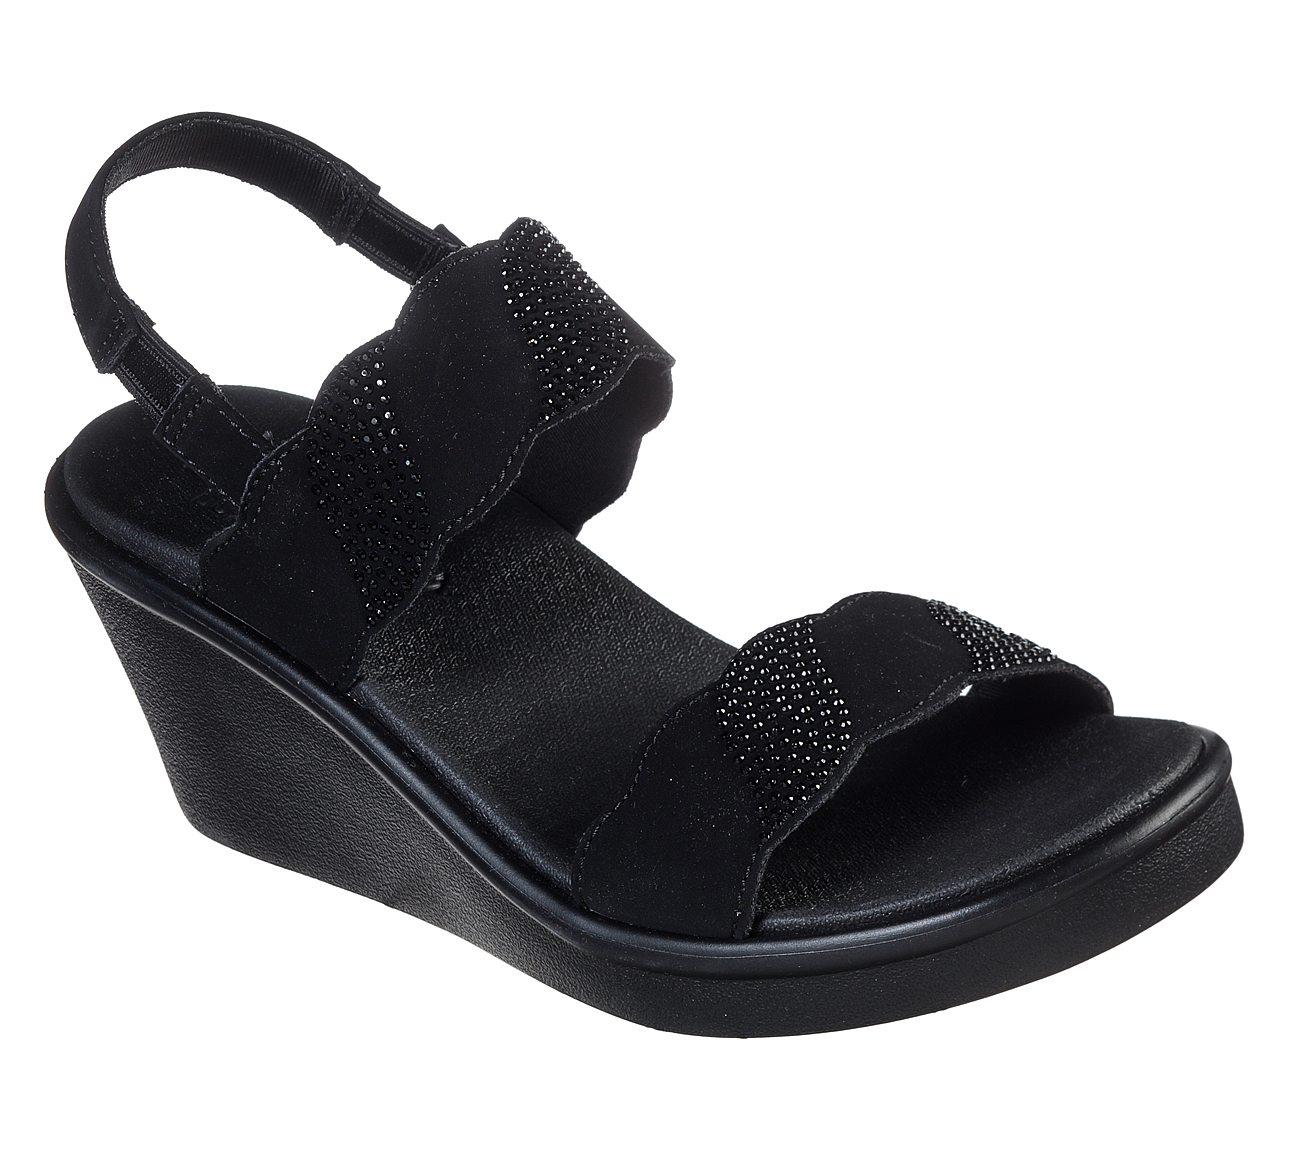 otoño Generoso gusano  Buy SKECHERS Rumble On - Secret Admirer Cali Shoes